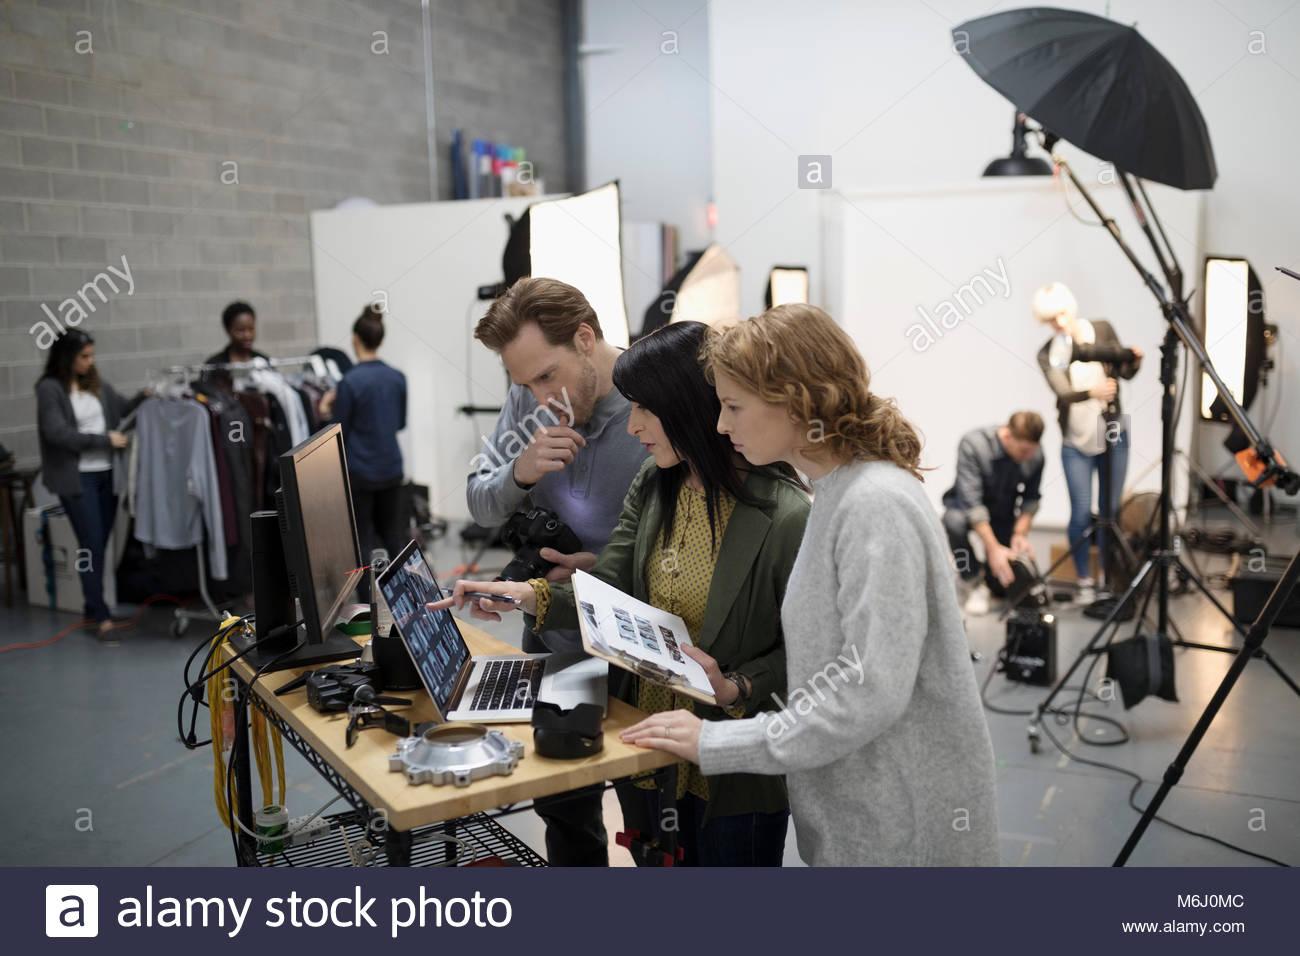 Photographer and production team preparing photo shoot in studio Stock Photo